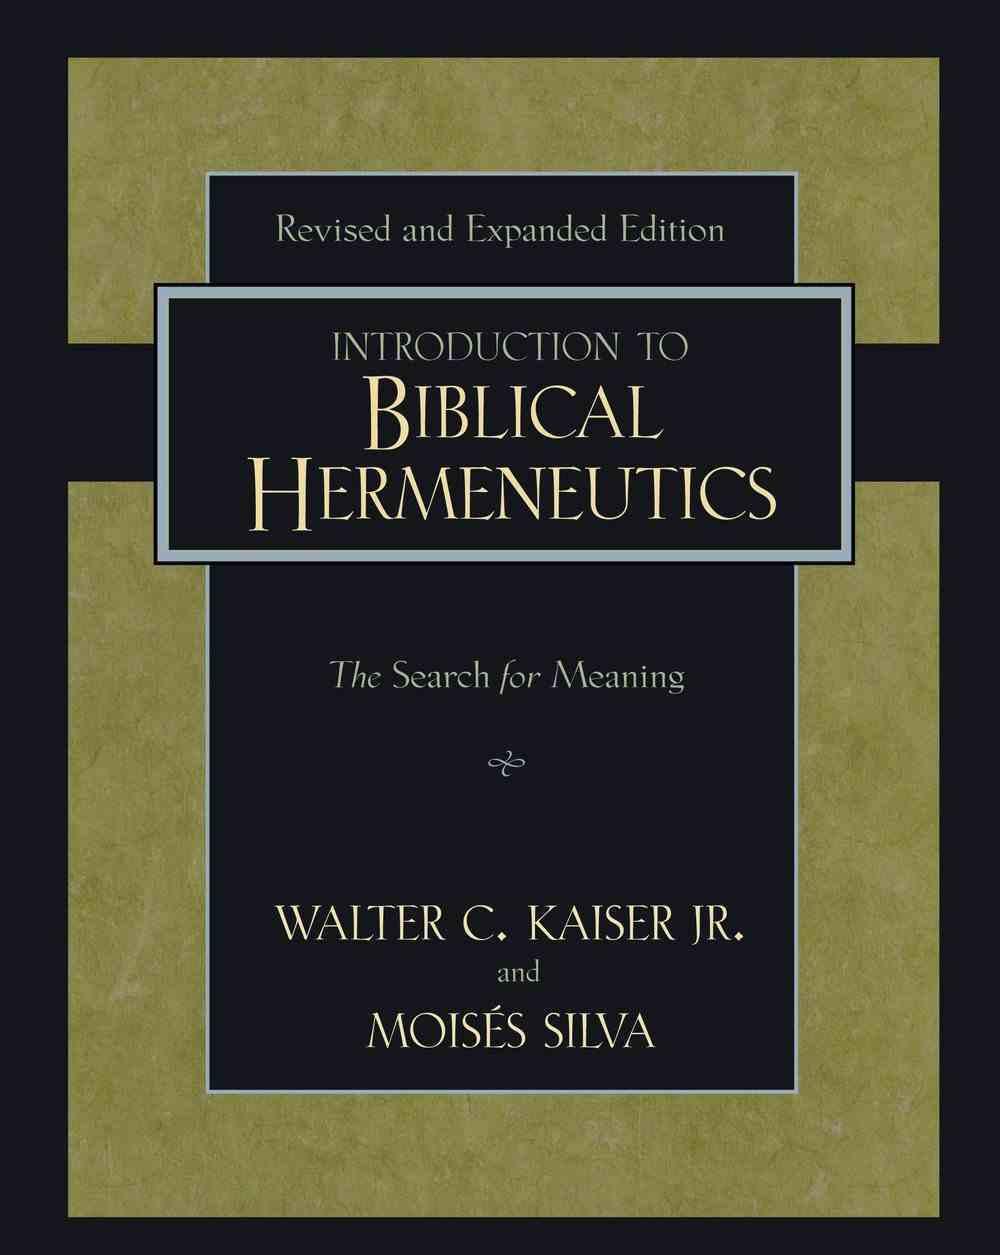 Introduction to Biblical Hermeneutics (And Expanded) Hardback